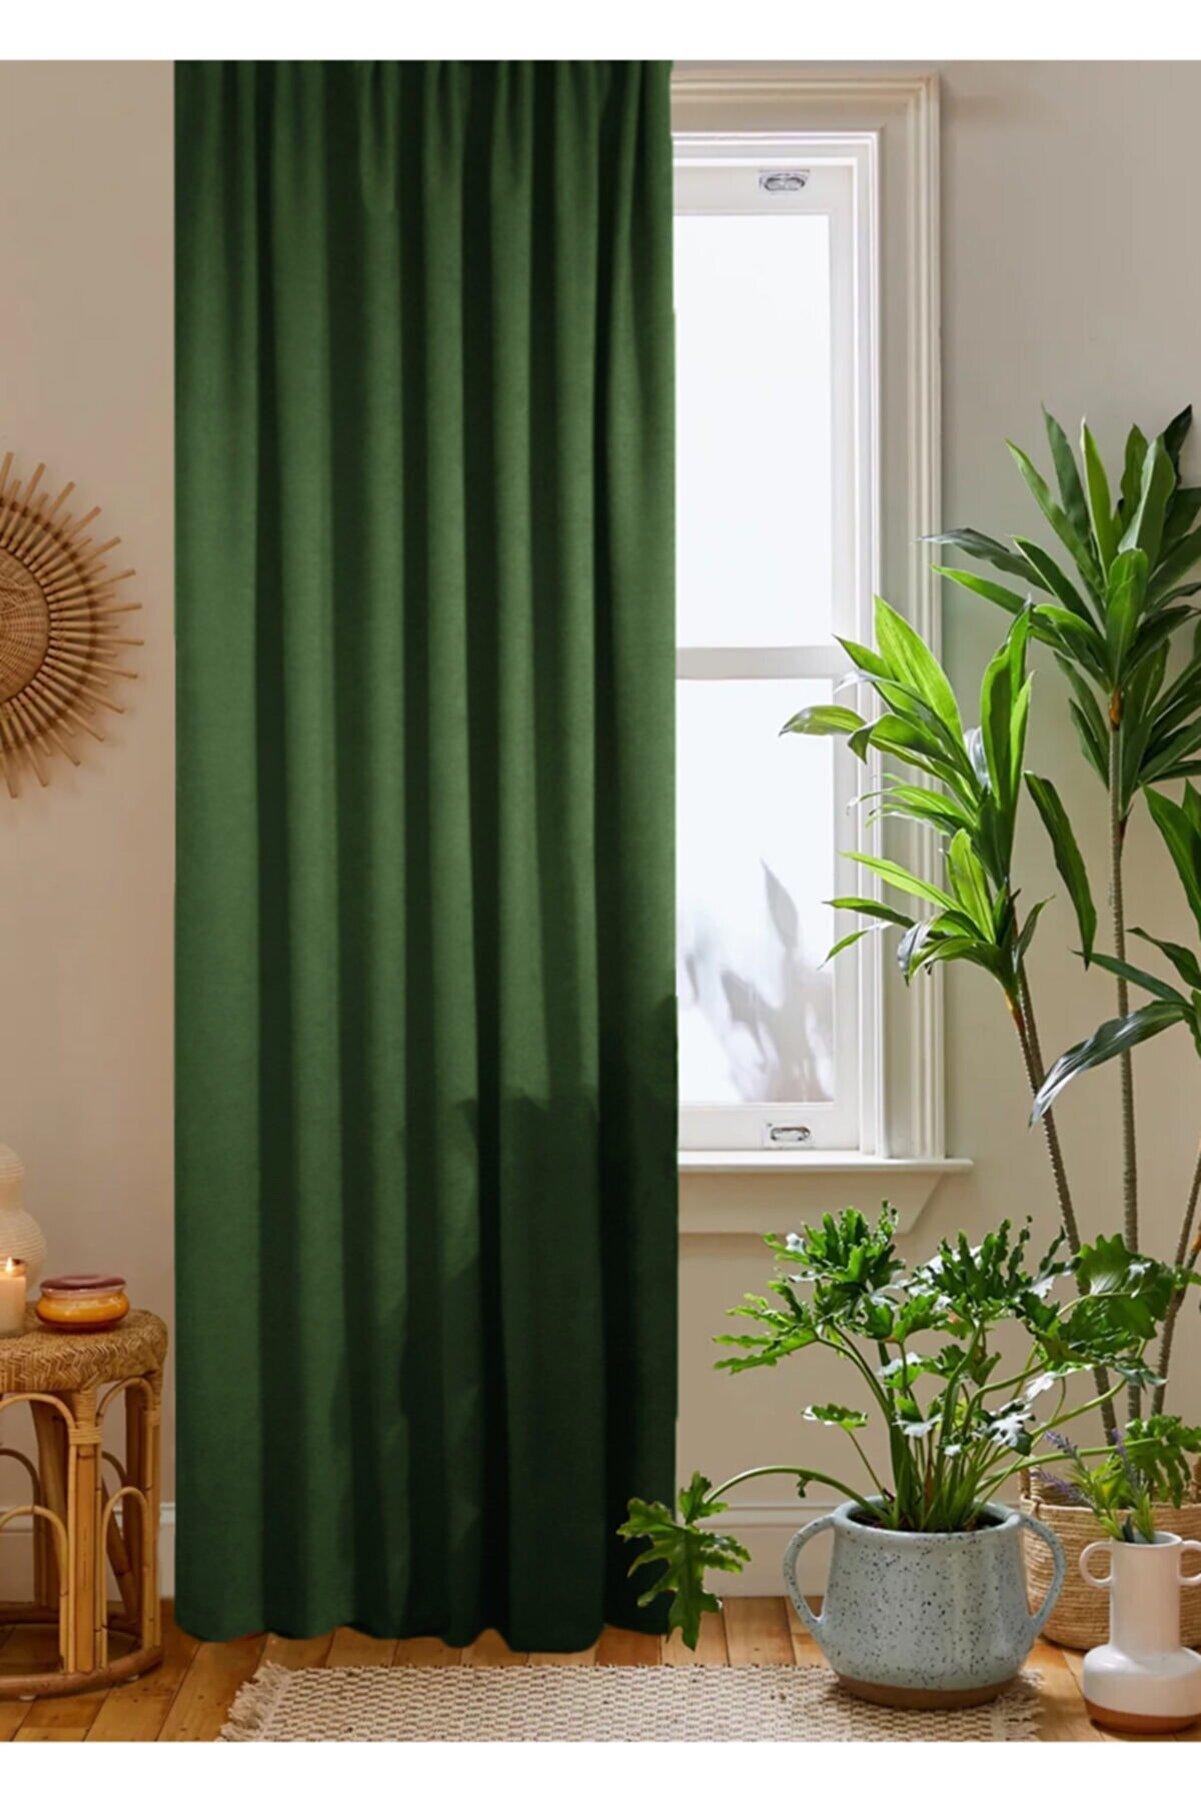 home color home Yeşil Petek Kadife Dokulu Fon Perde Düz Dikişli Ekstrafor Büzgü 1.sınıf Kalite